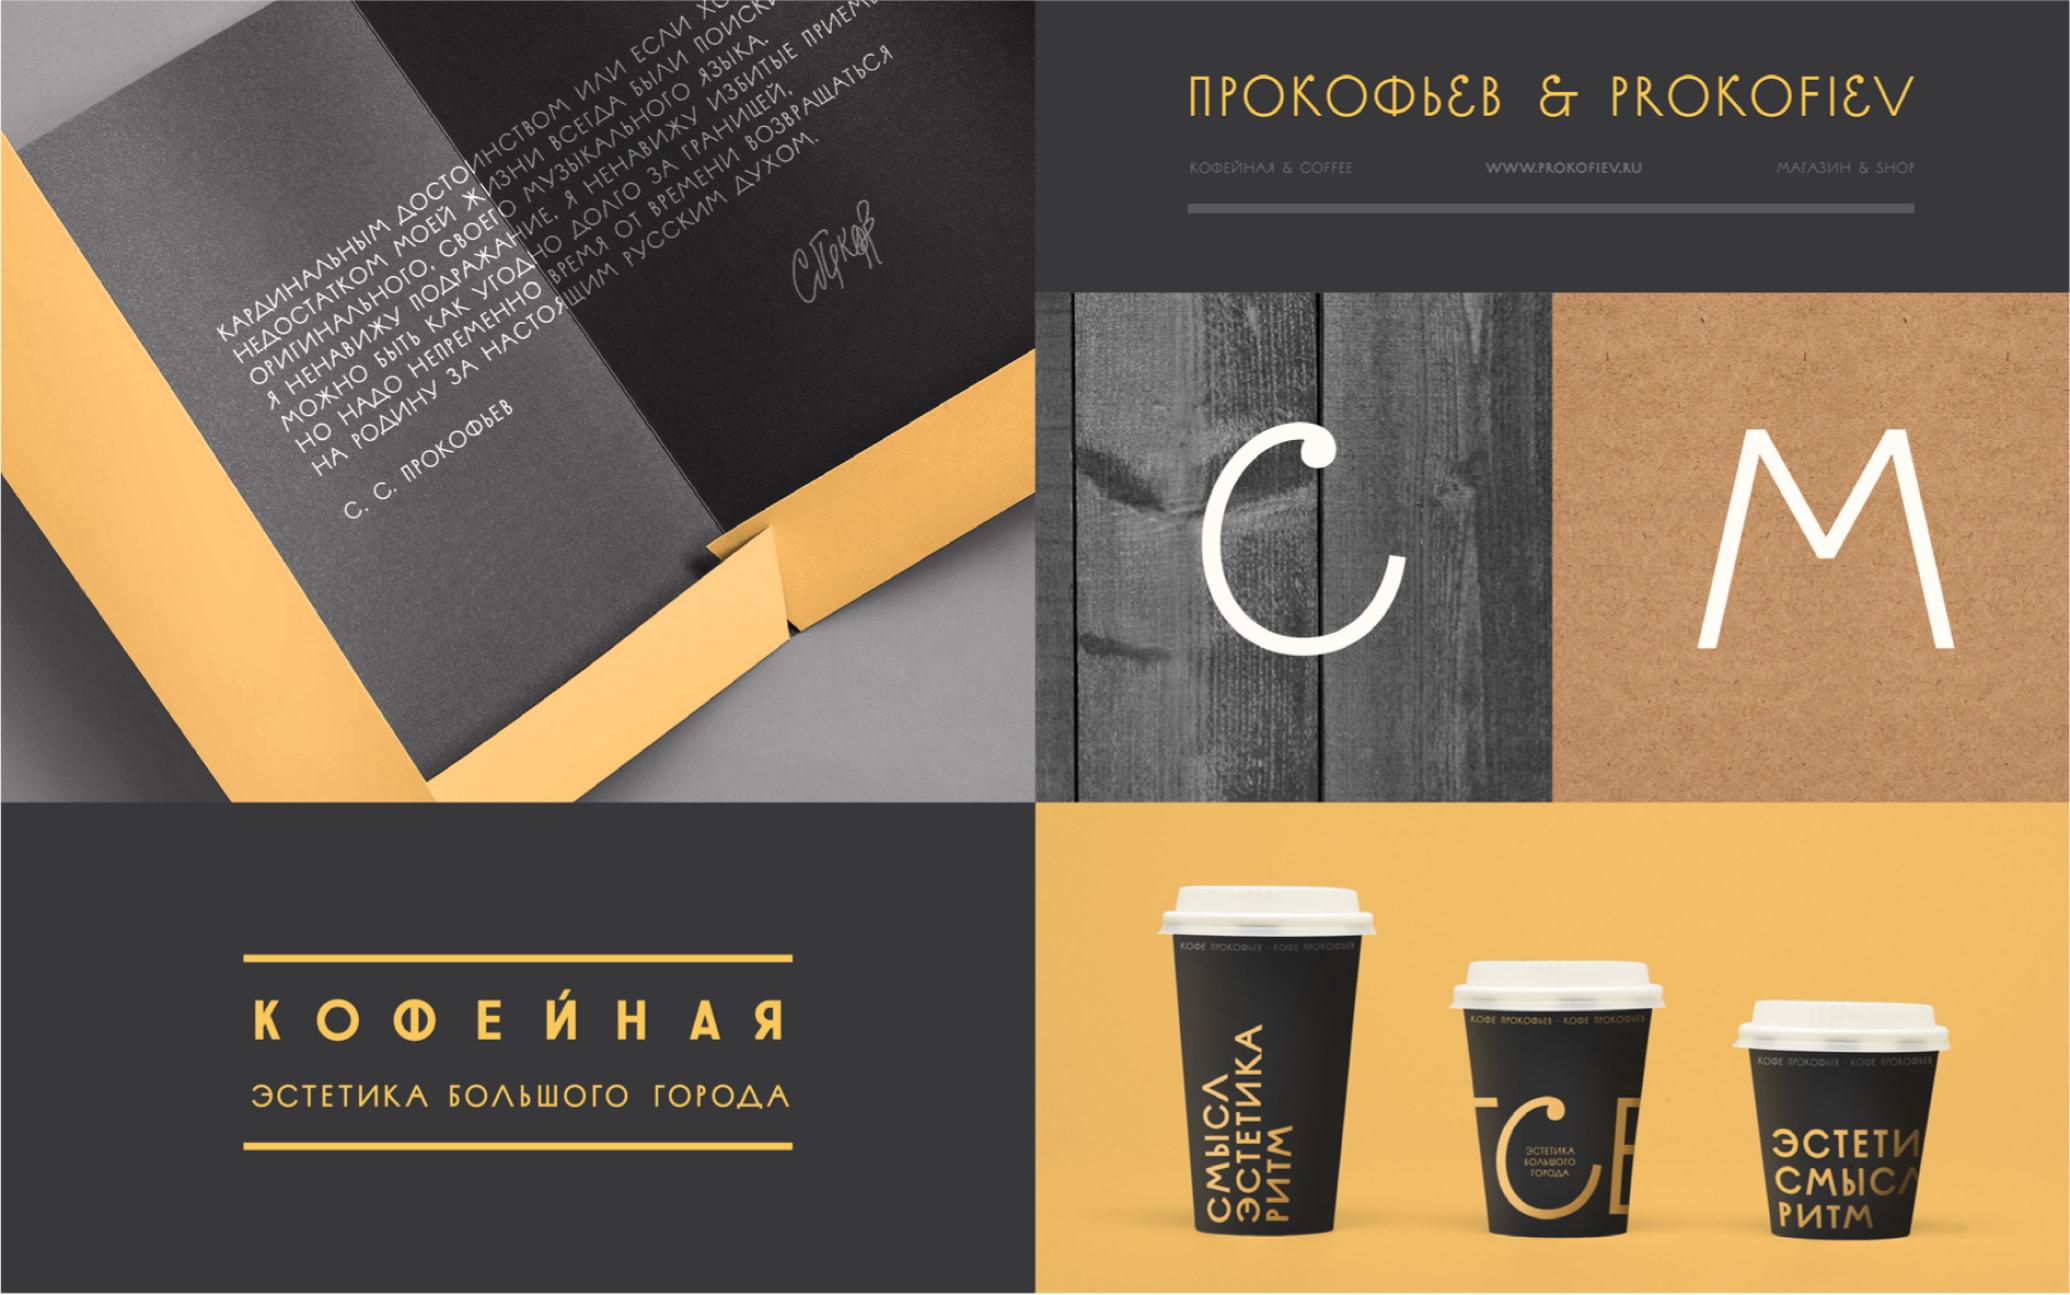 prokofiev_09-2